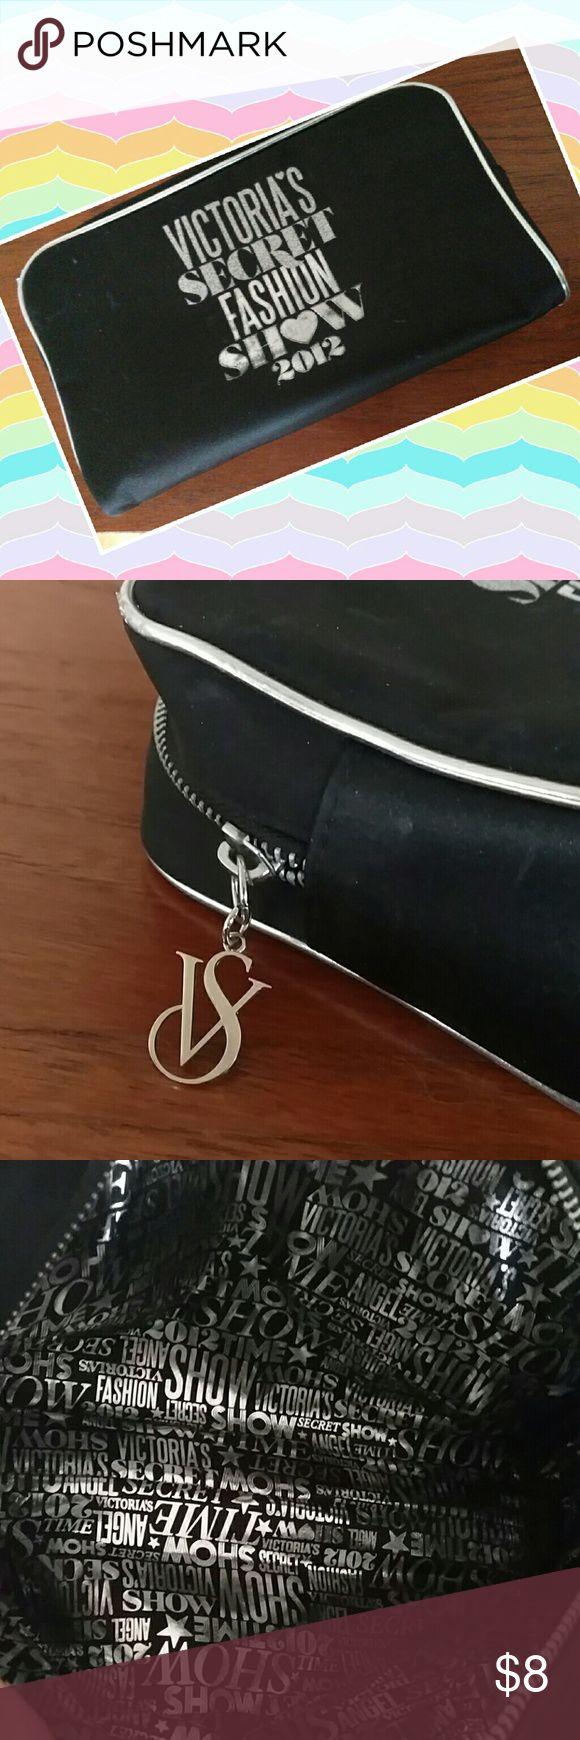 New vic secret large makeup case Never used large makeup bag. Black w silver trim. Vs zipper pull Victoria's Secret Bags Cosmetic Bags & Cases